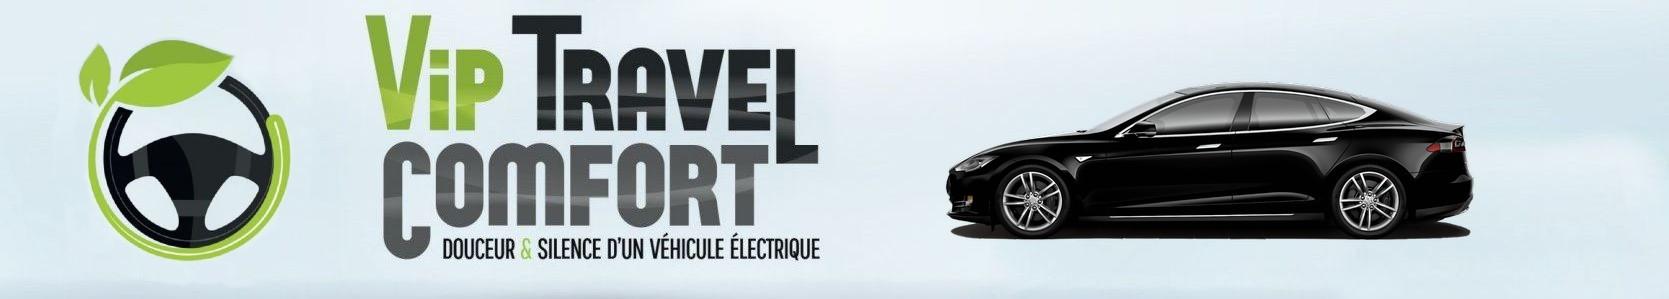 entete-pages-vtc-chauffeur-prive-nantes-44-montaigu-la-roche-sur-yon-vendee-85 (1)